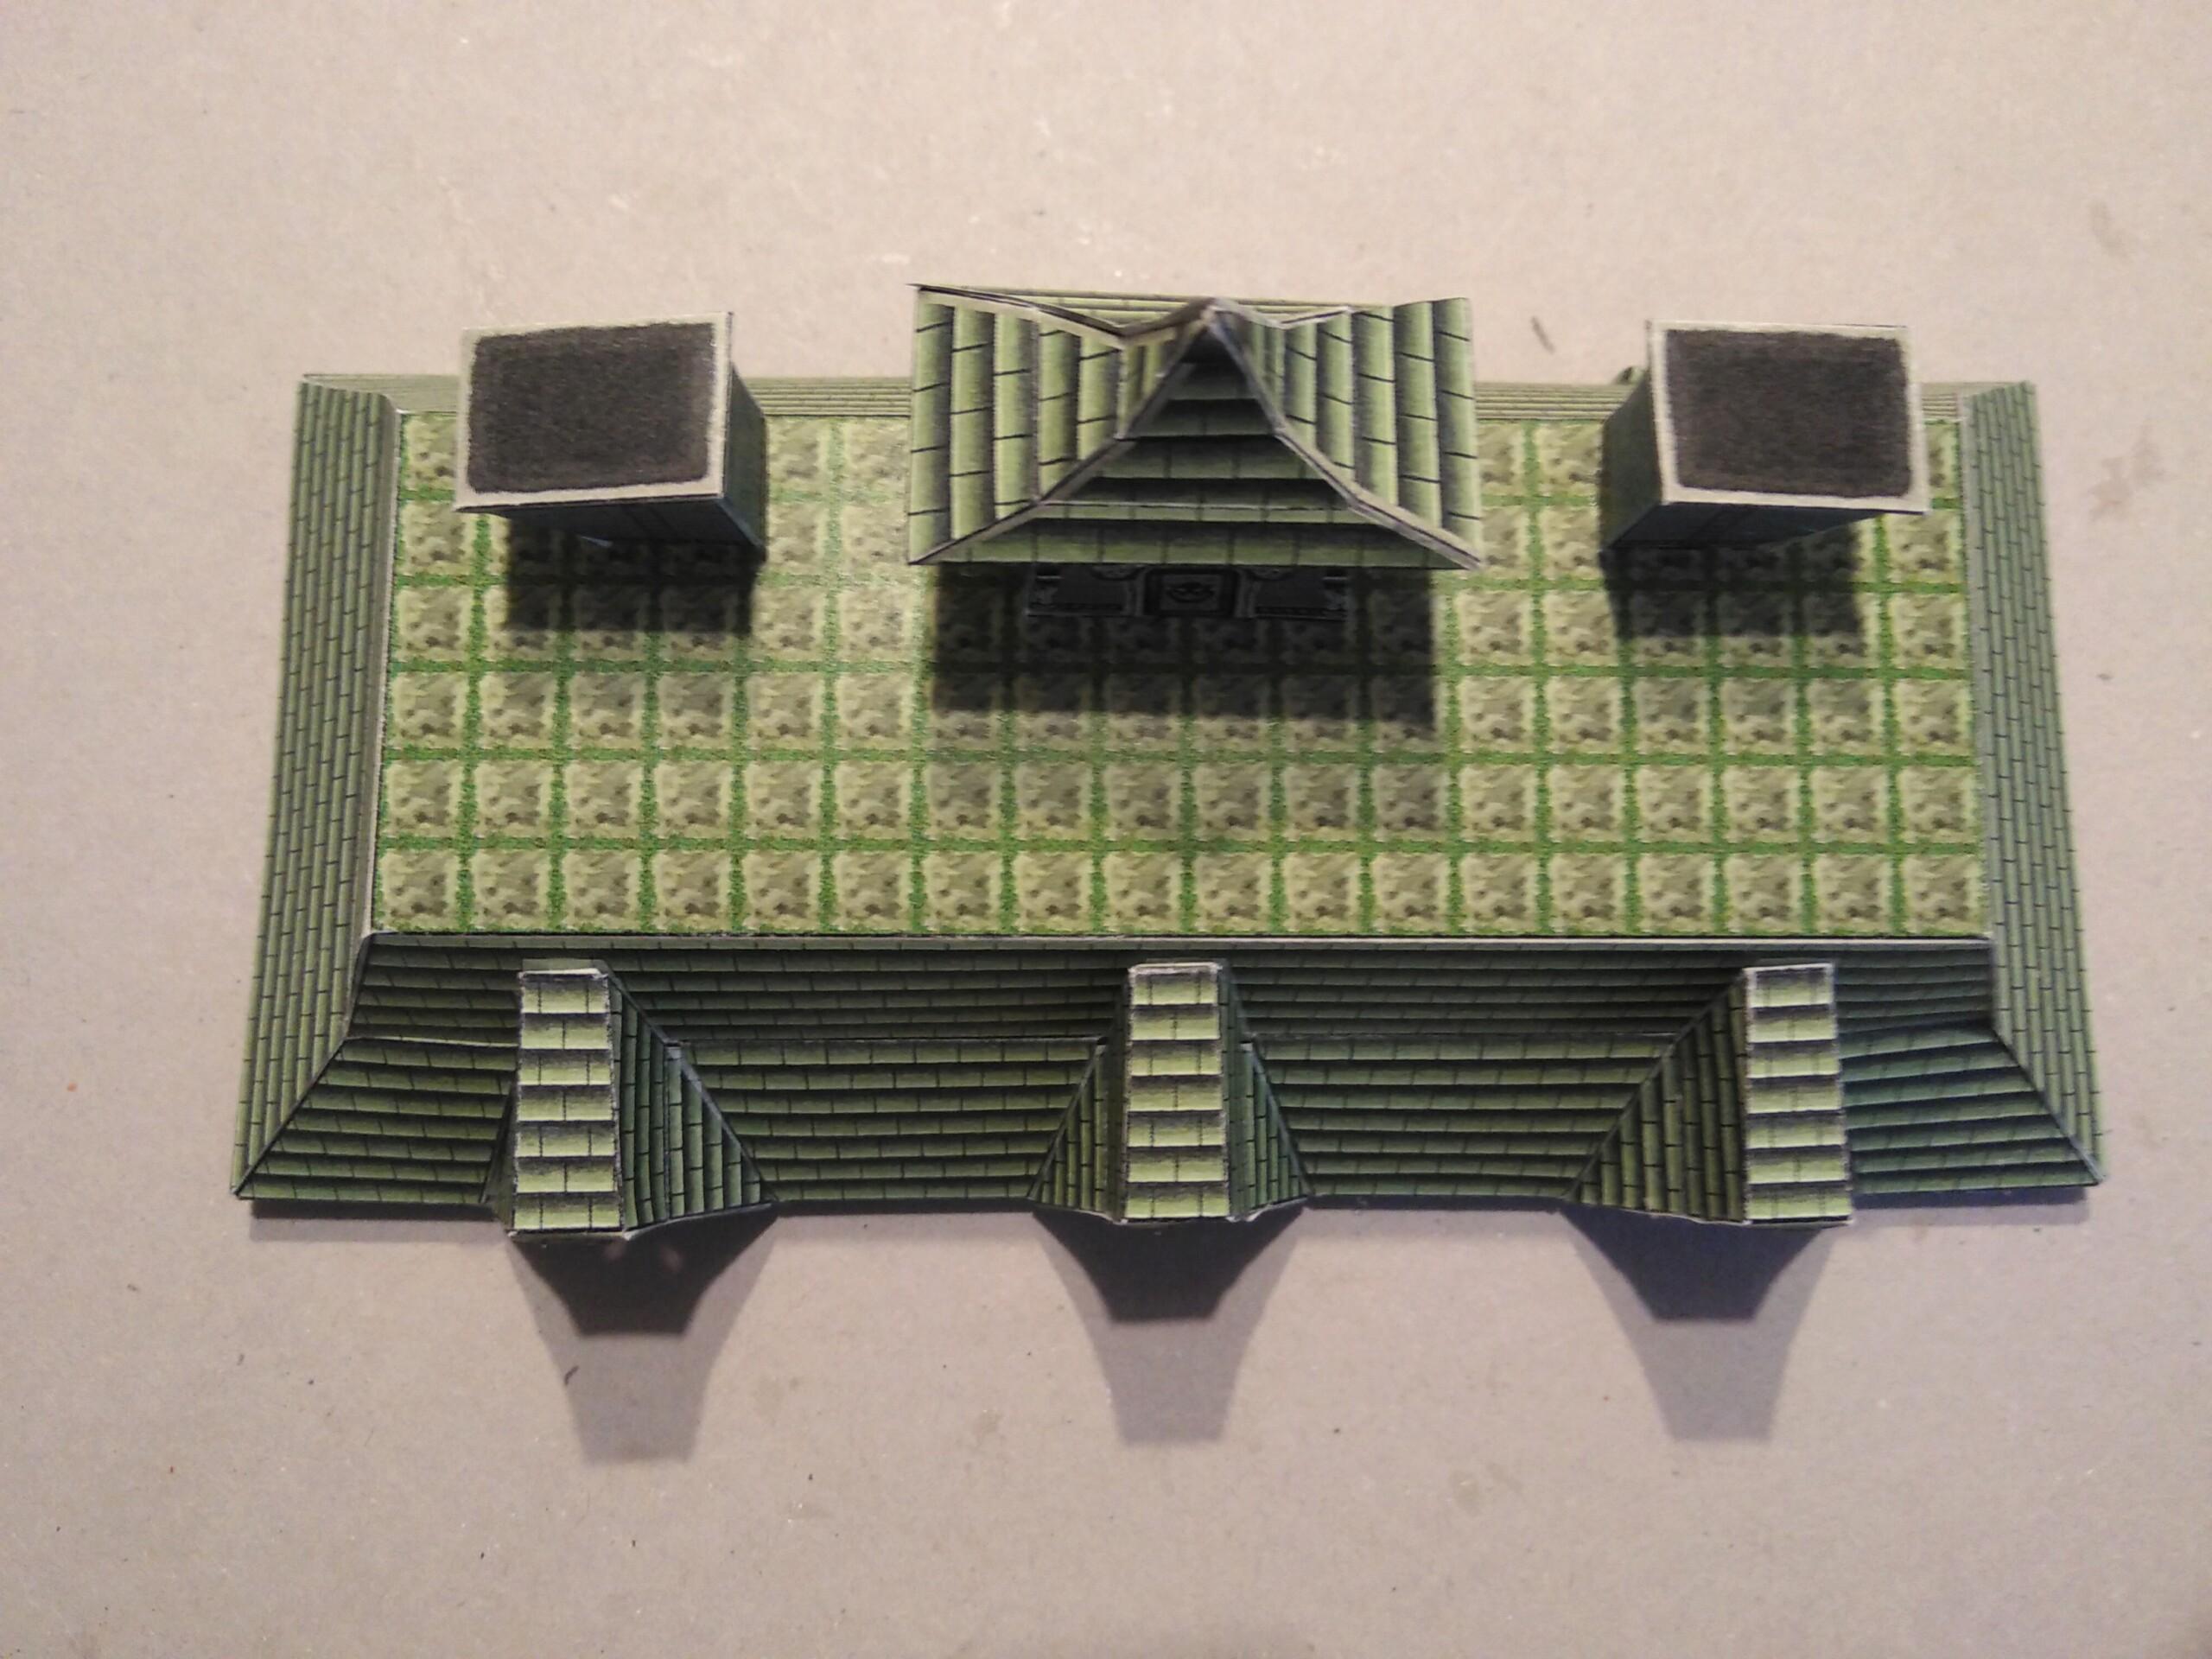 Luigi's Mansion - Die Gruselvilla aus dem Gamecube-Klassiker Img_2032